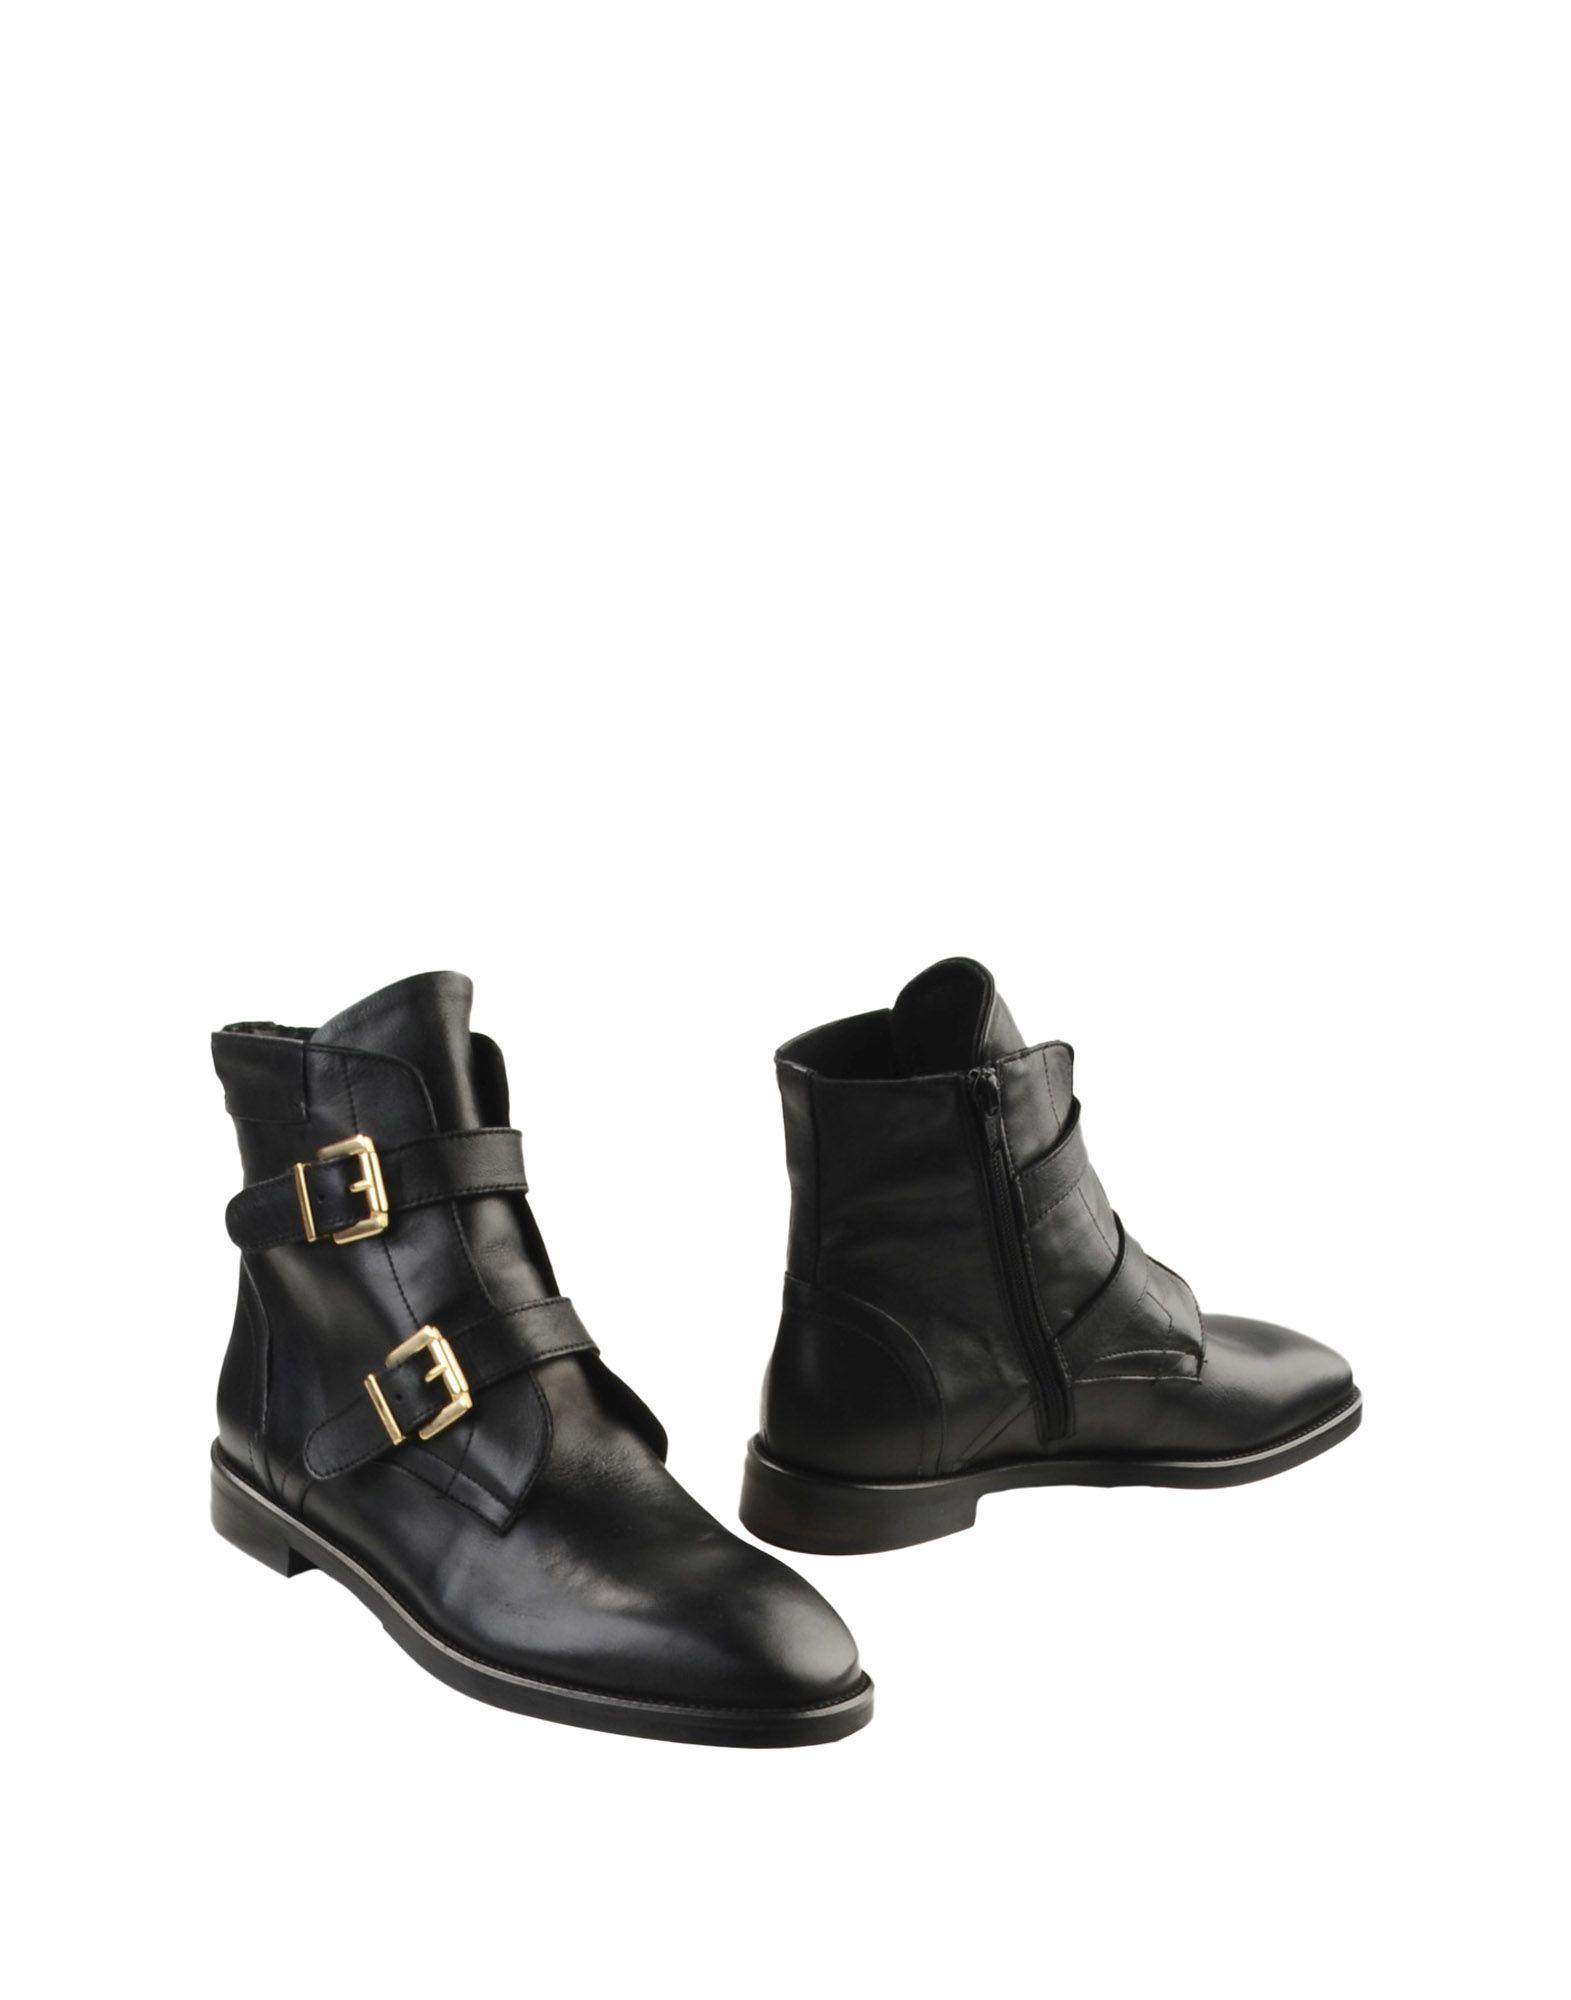 Fabrizio Chini Ankle Chini Boot - Women Fabrizio Chini Ankle Ankle Boots online on  Australia - 11545247TM 251526